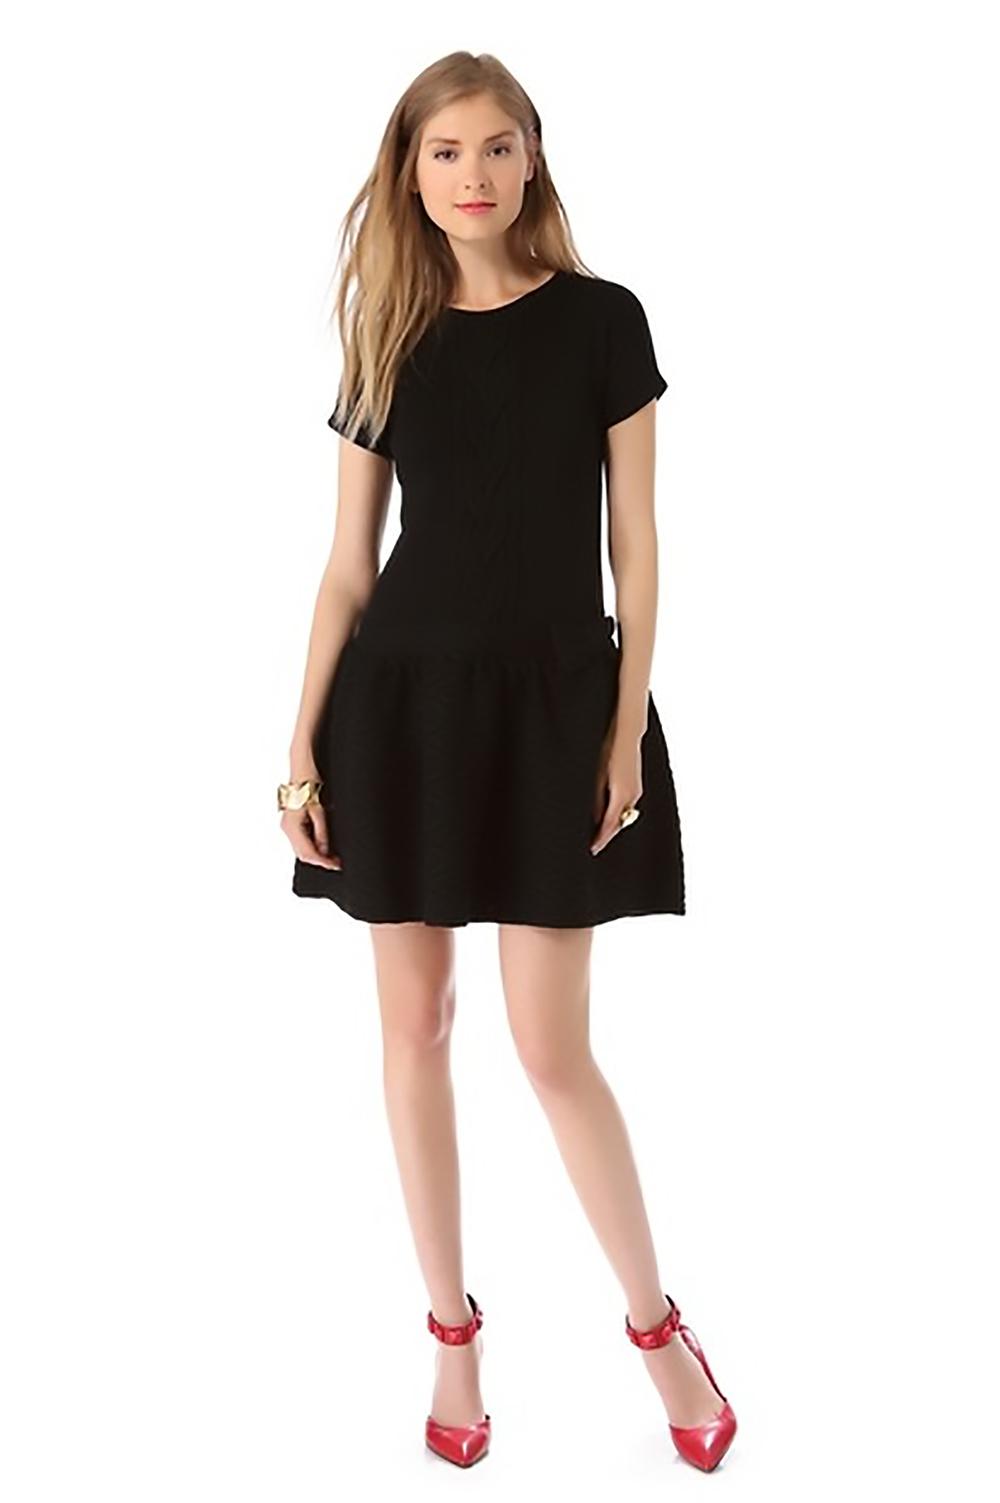 shop bop red valentino merino mini dress short dresses 1500.jpg